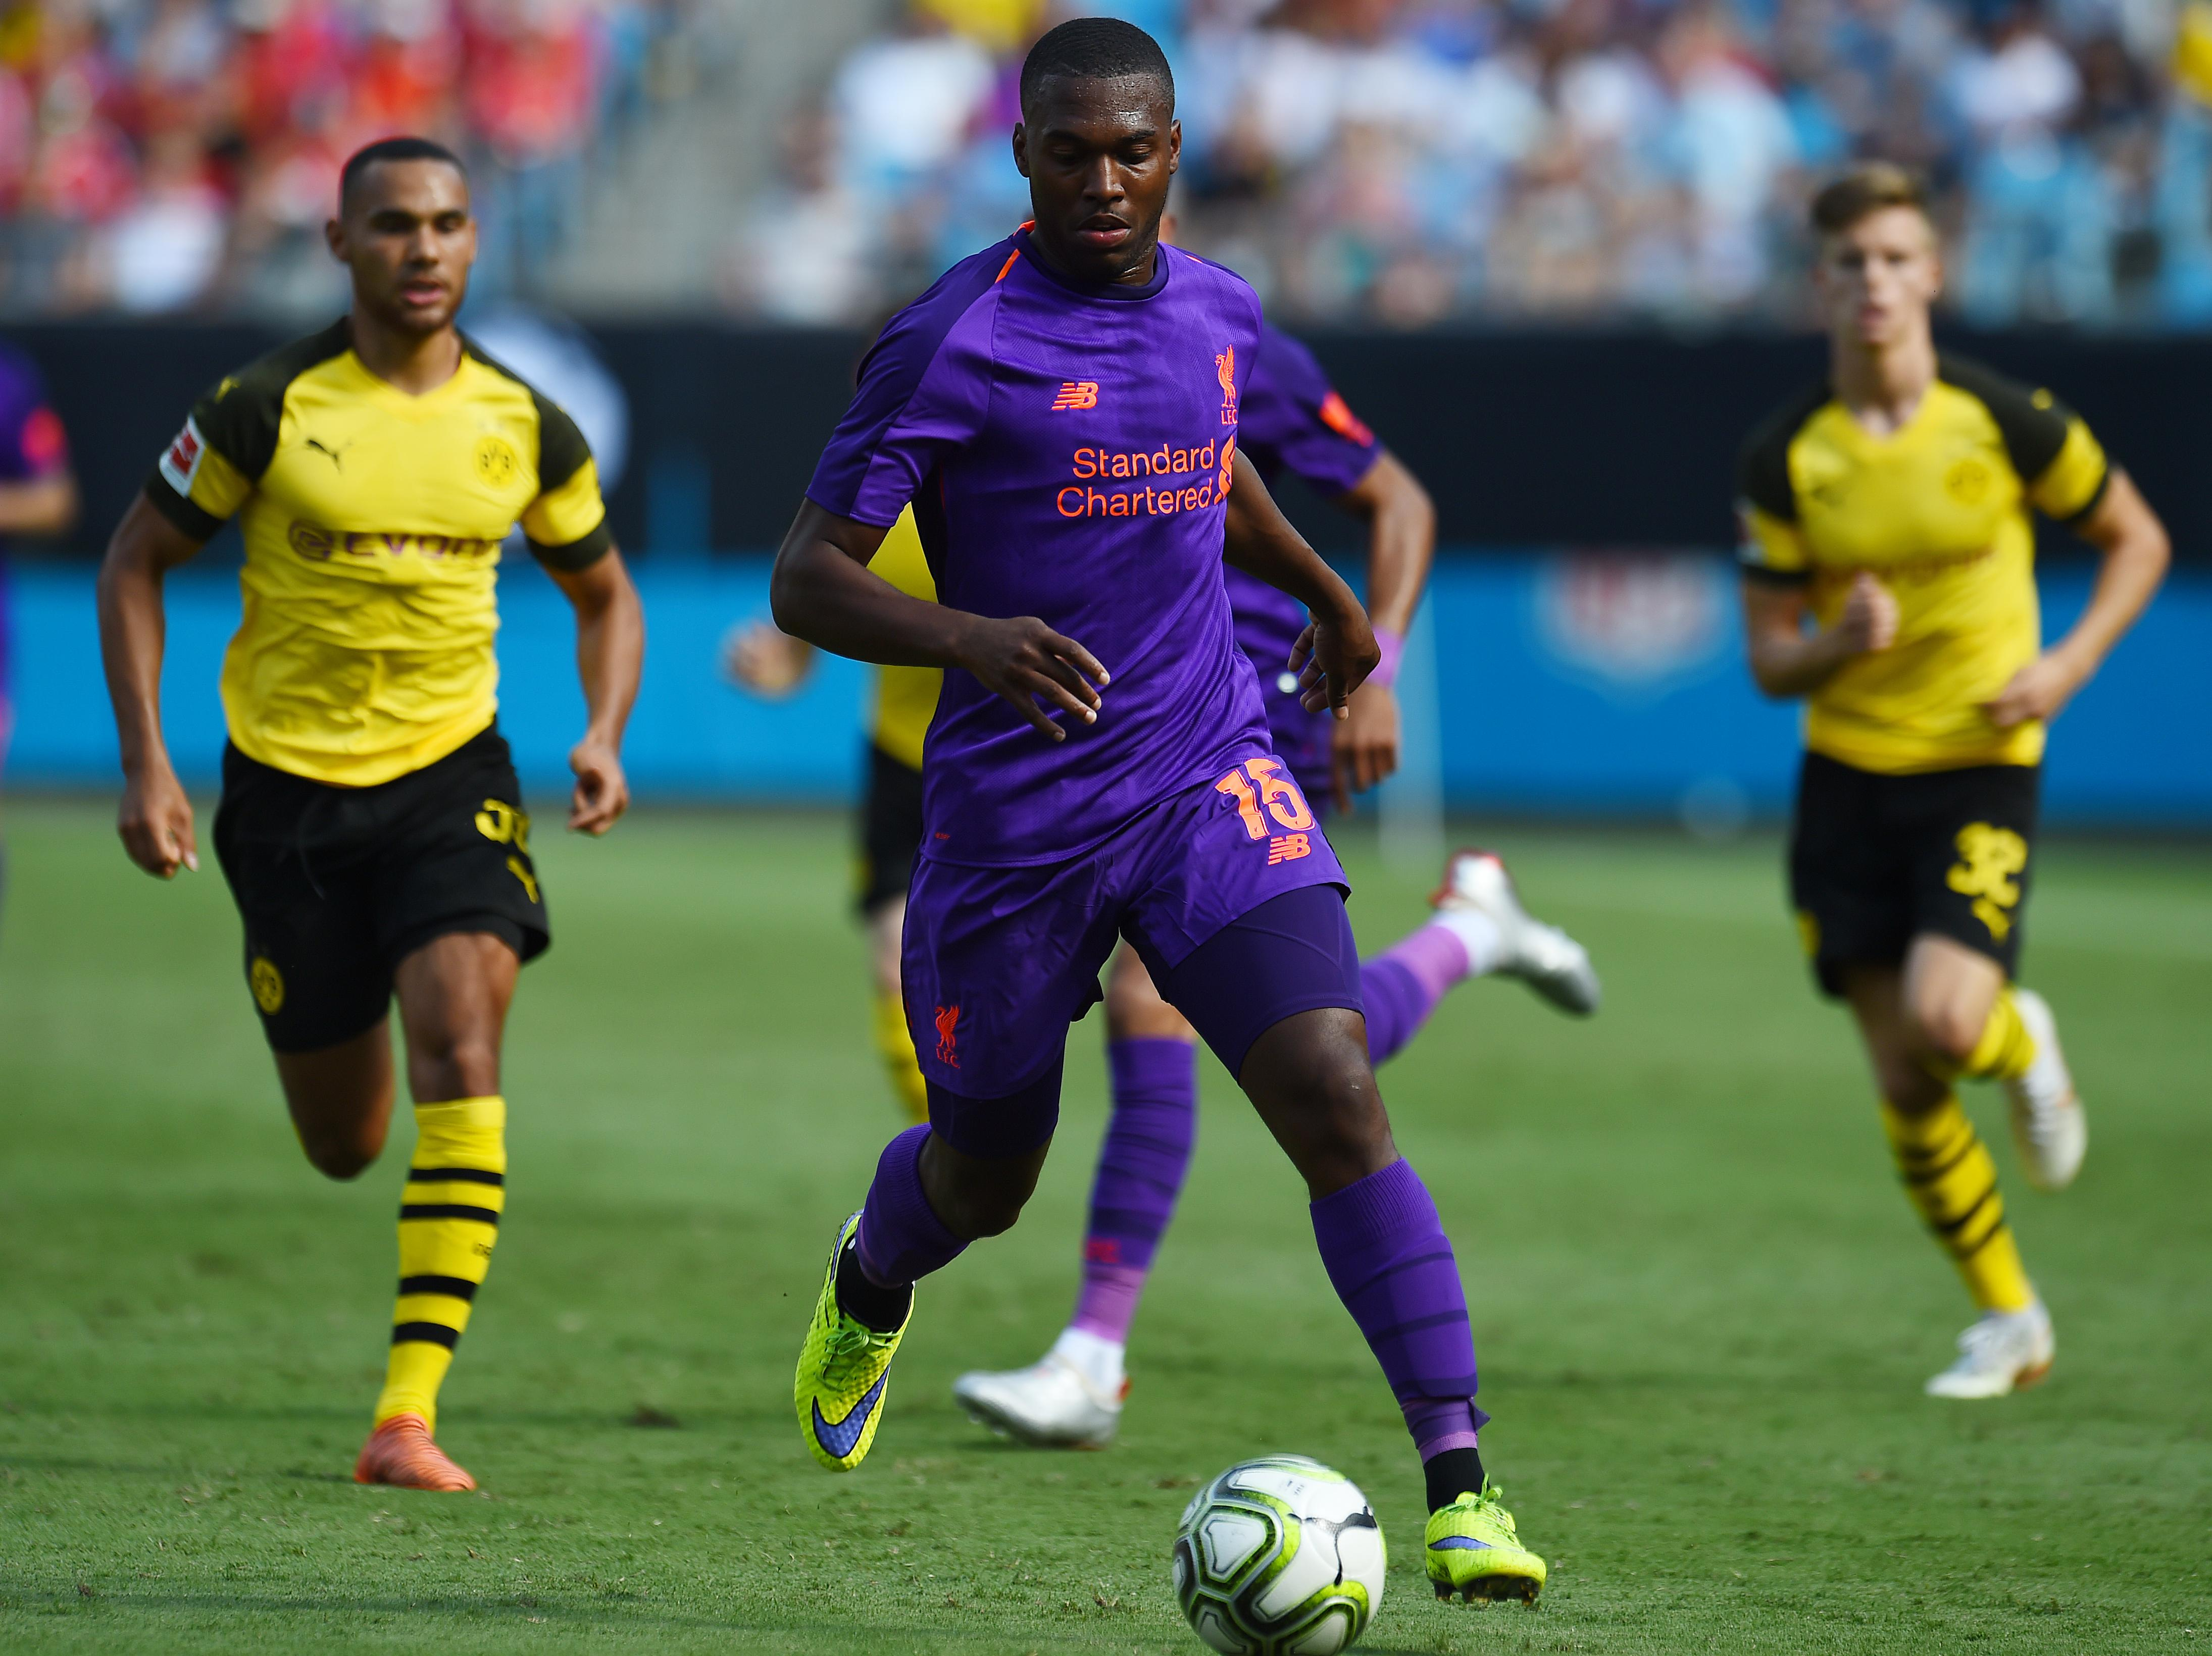 Sturridge was also a substitute in the defeat to Borussia Dortmund